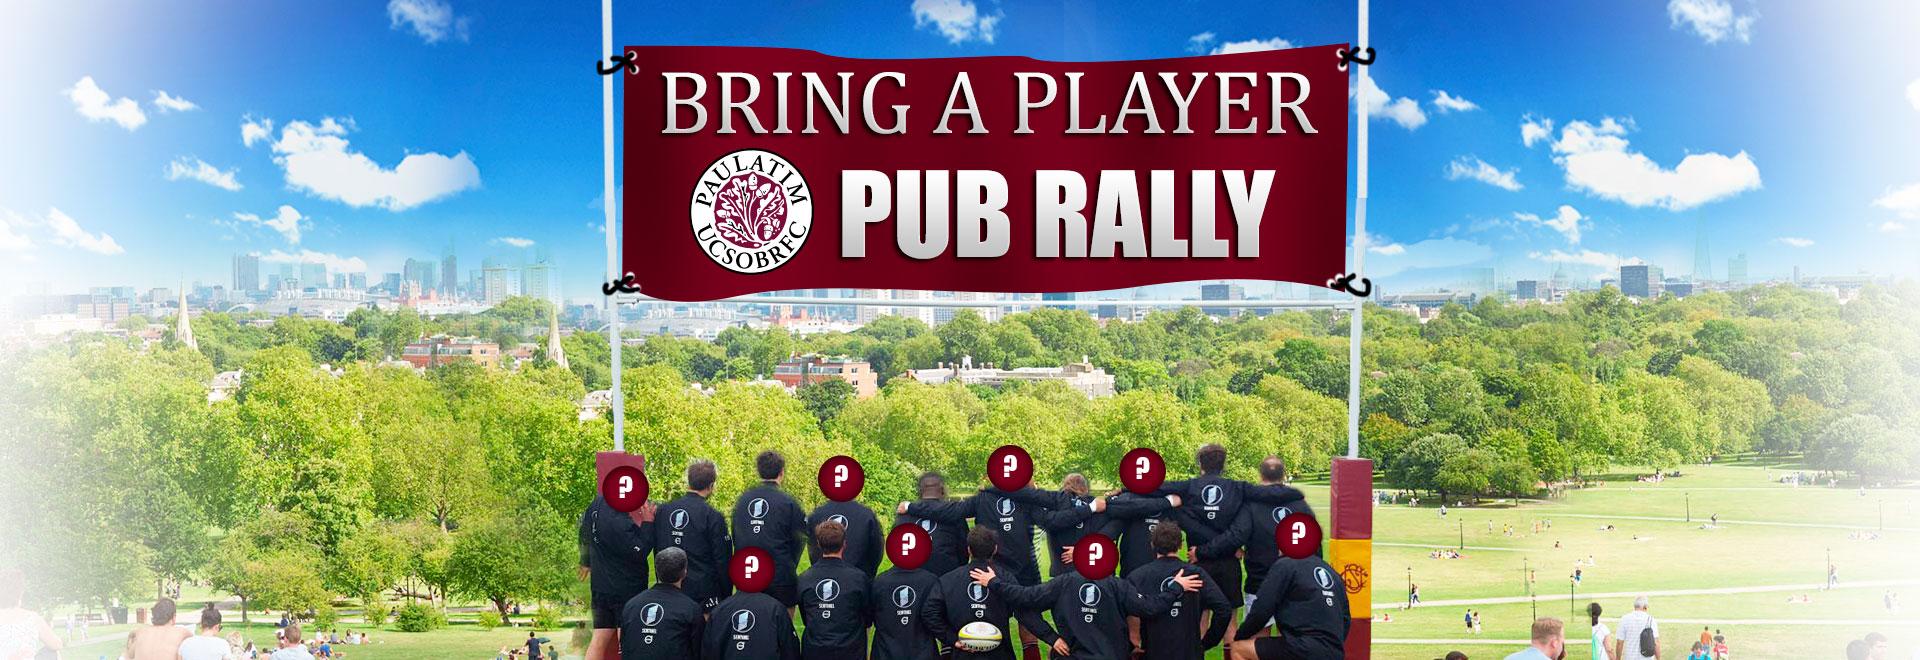 Primrose Hill Pub Rally 2017 UCSOBRFU, New Players Welcome